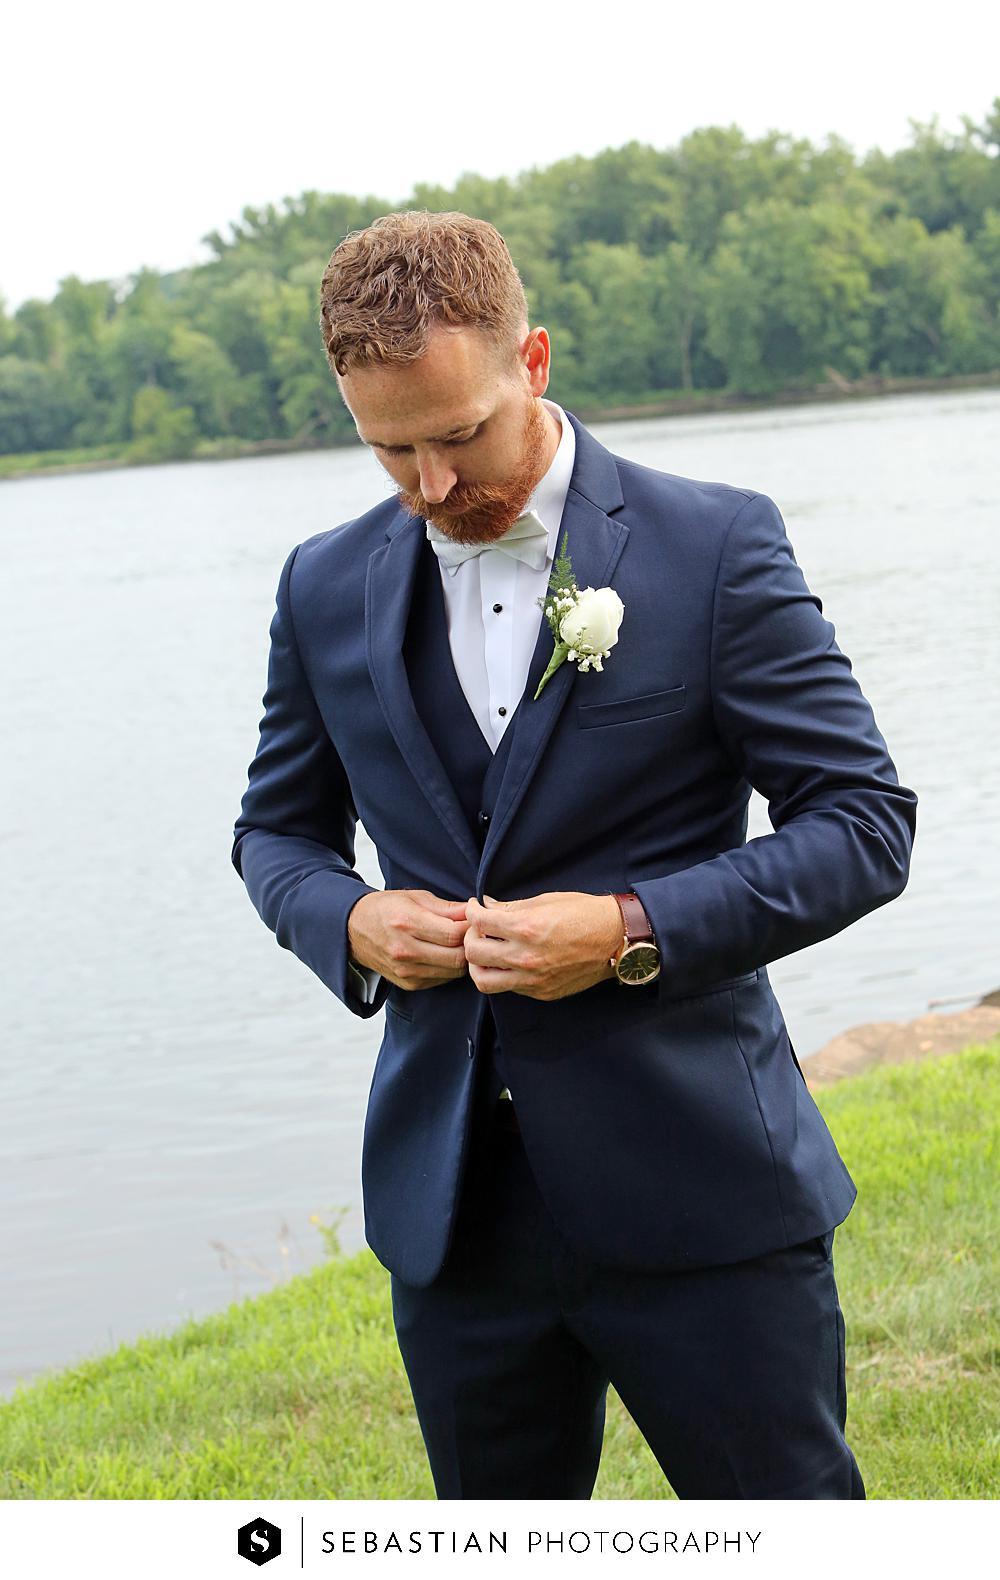 Sebastian Photography_Saint Clements Castle Wedding_CT Wedding Photographer__7026.jpg